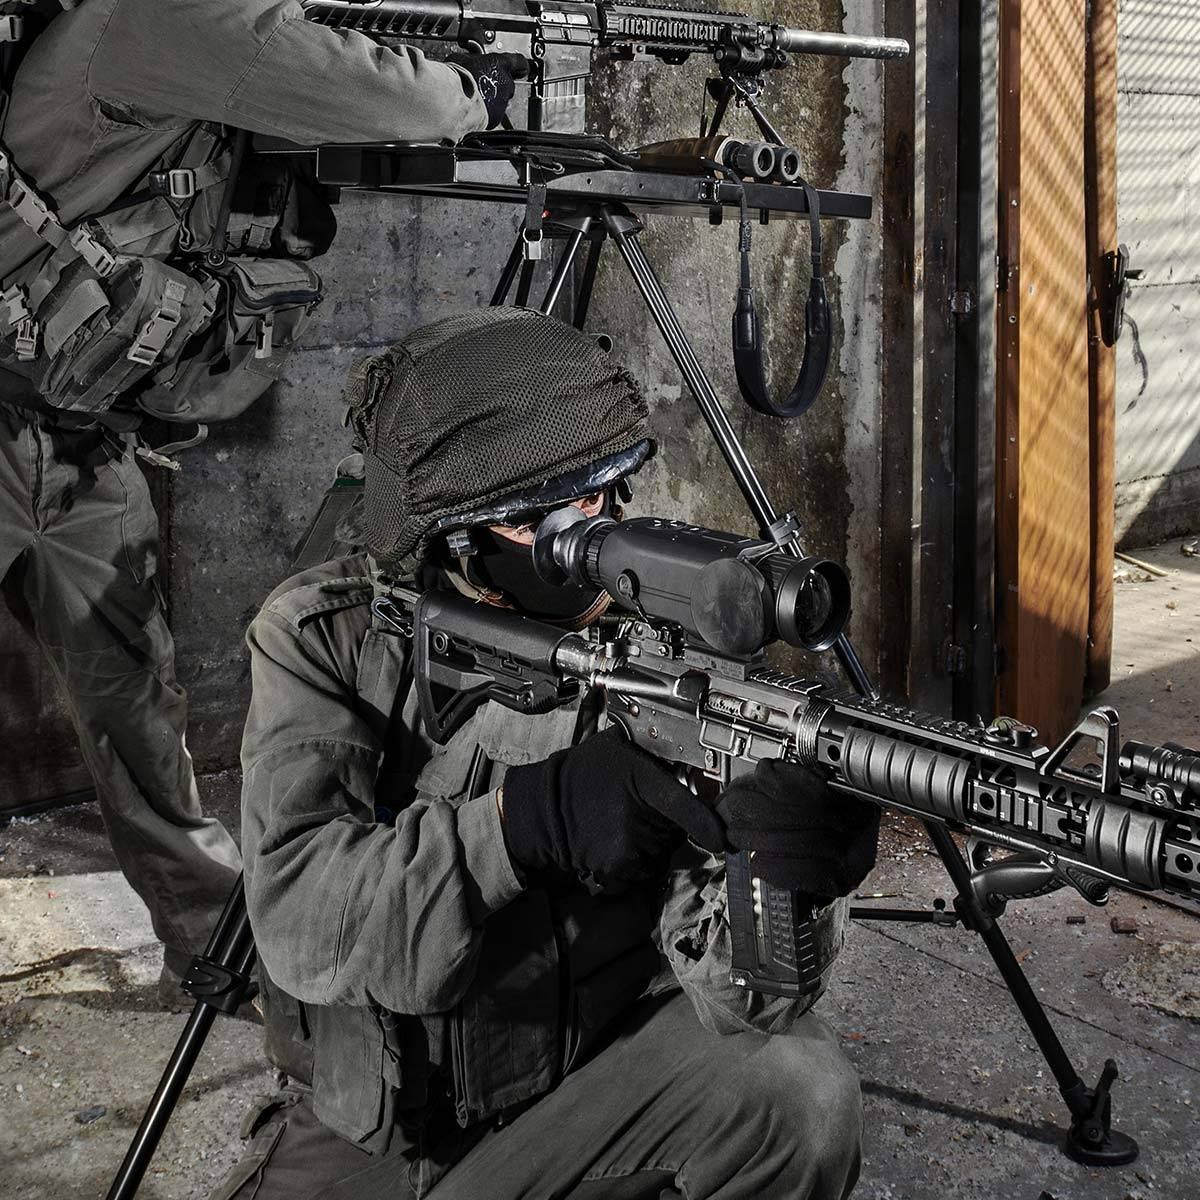 fab-defense-gl-shock-ar15-m16-shock-absorbing-butt-stock-6